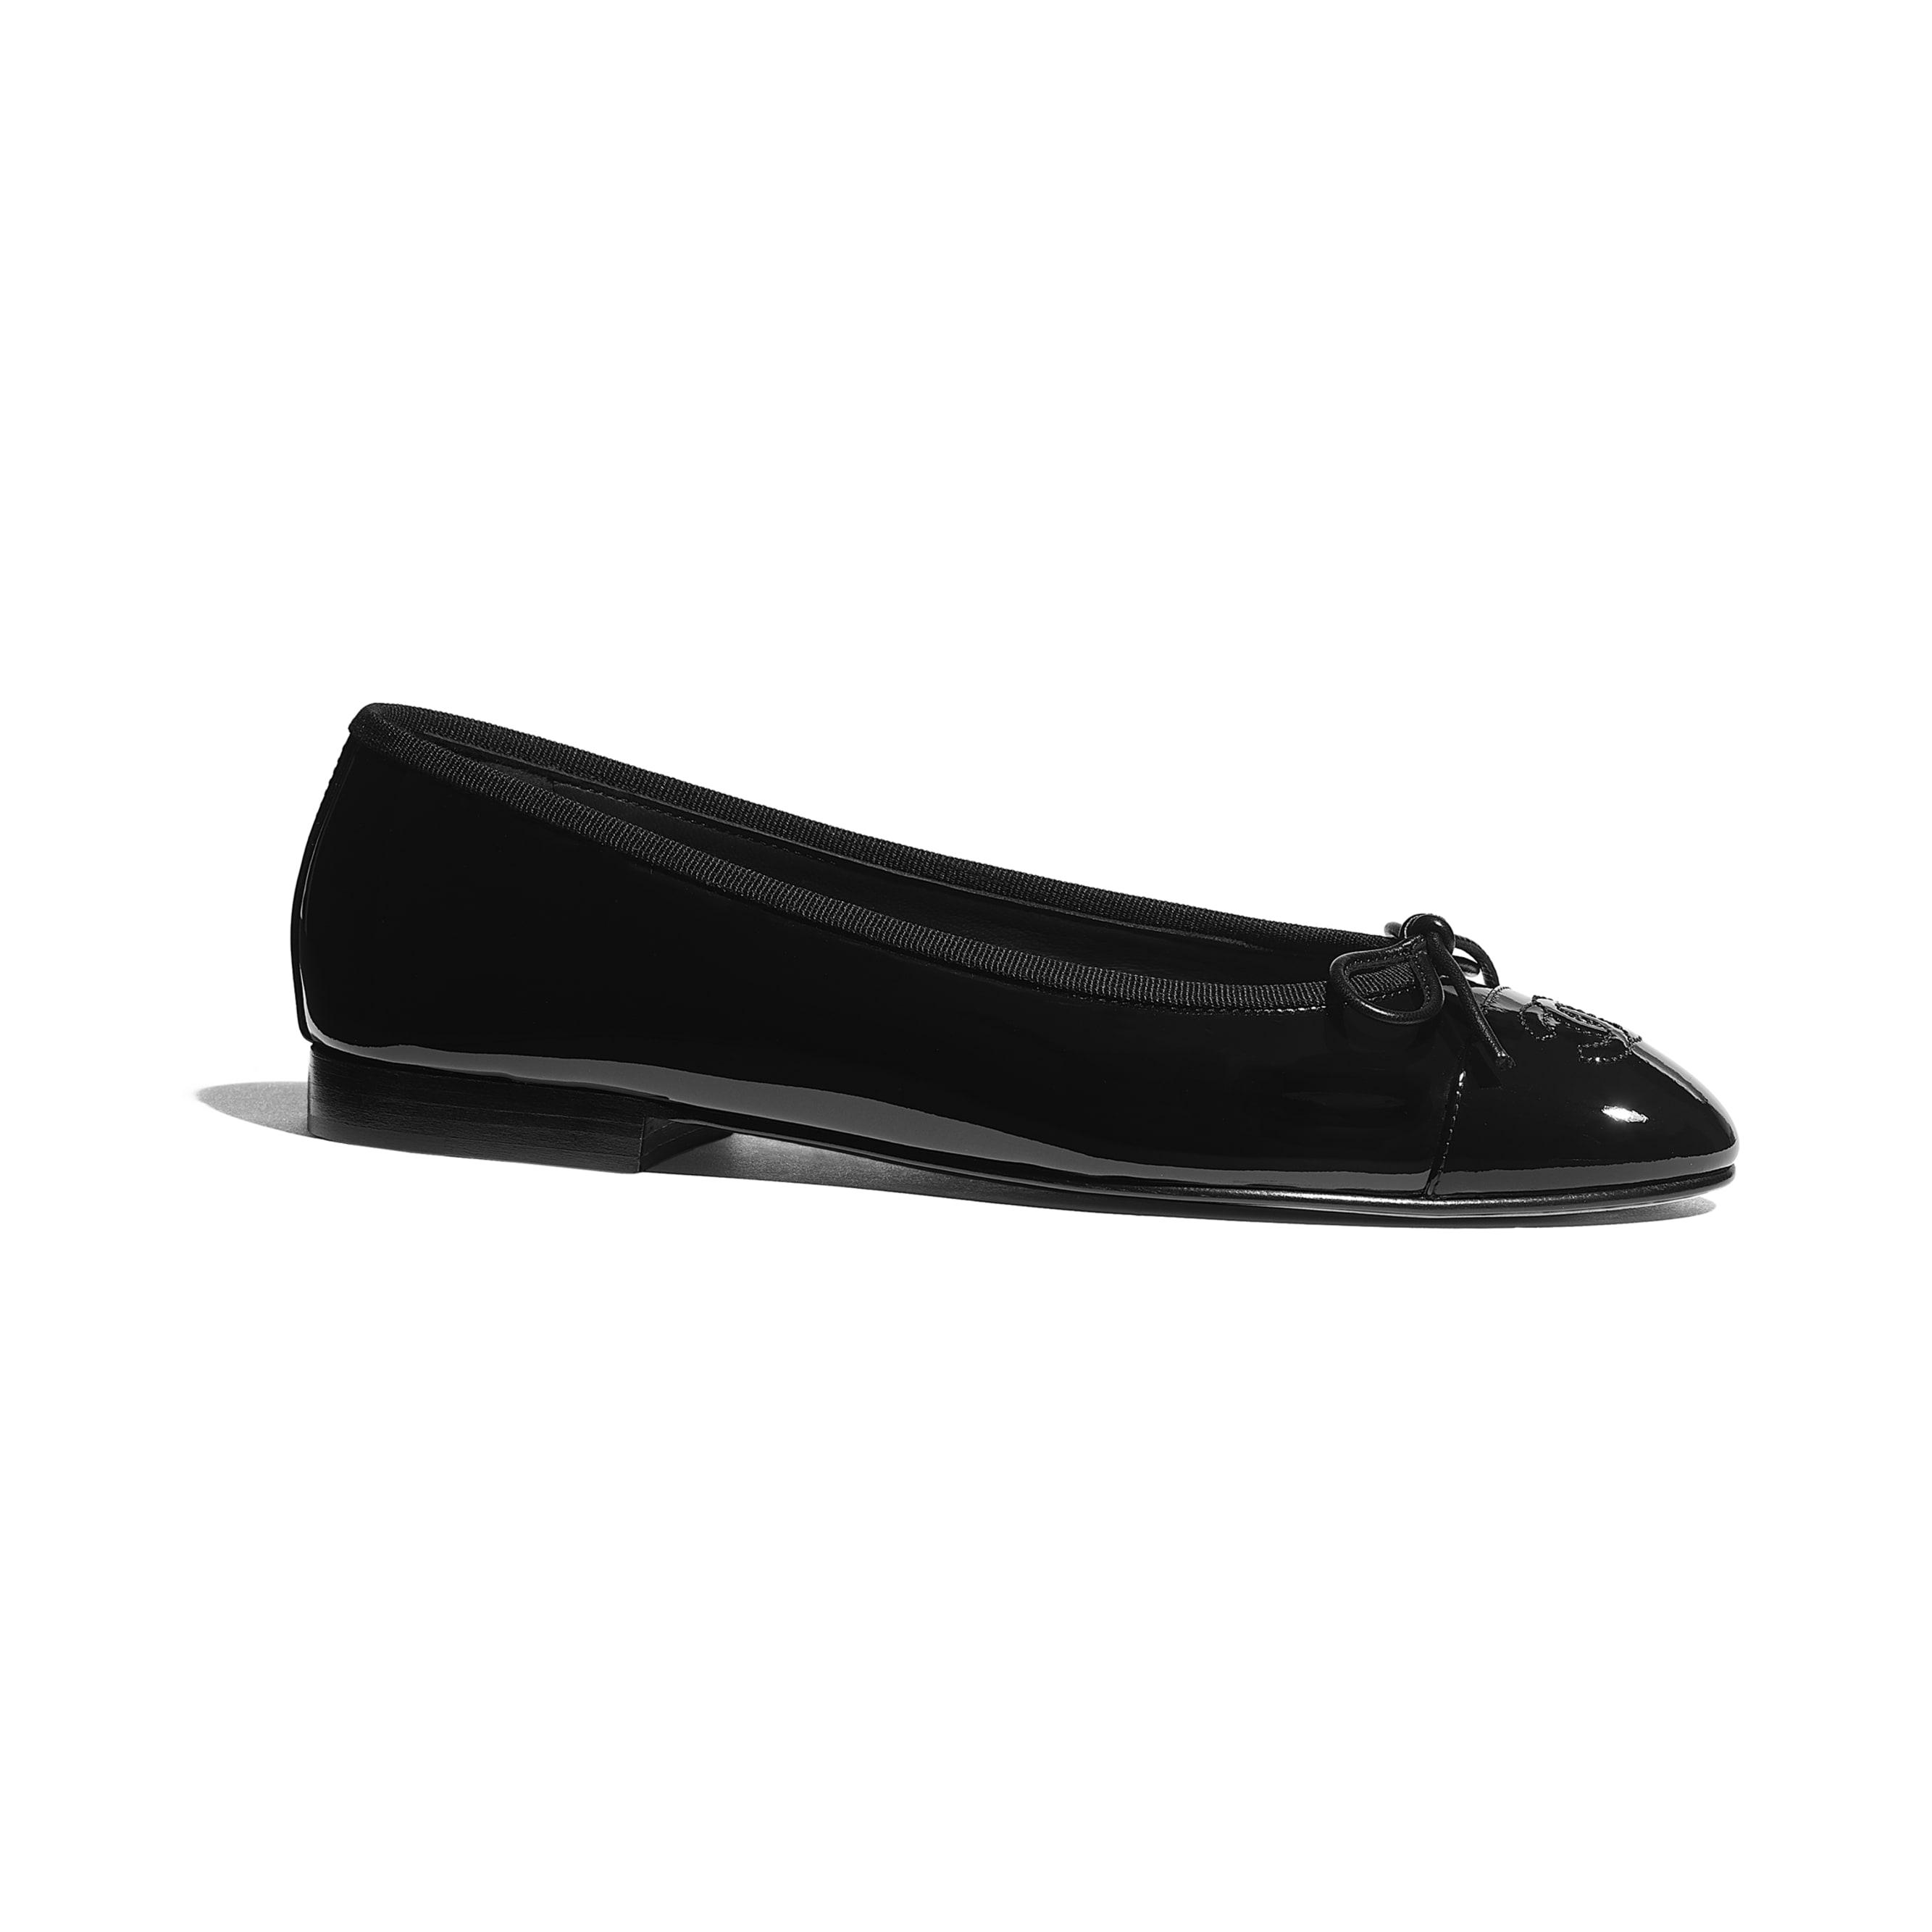 Ballerinas - Black - Patent Calfskin - CHANEL - Default view - see standard sized version